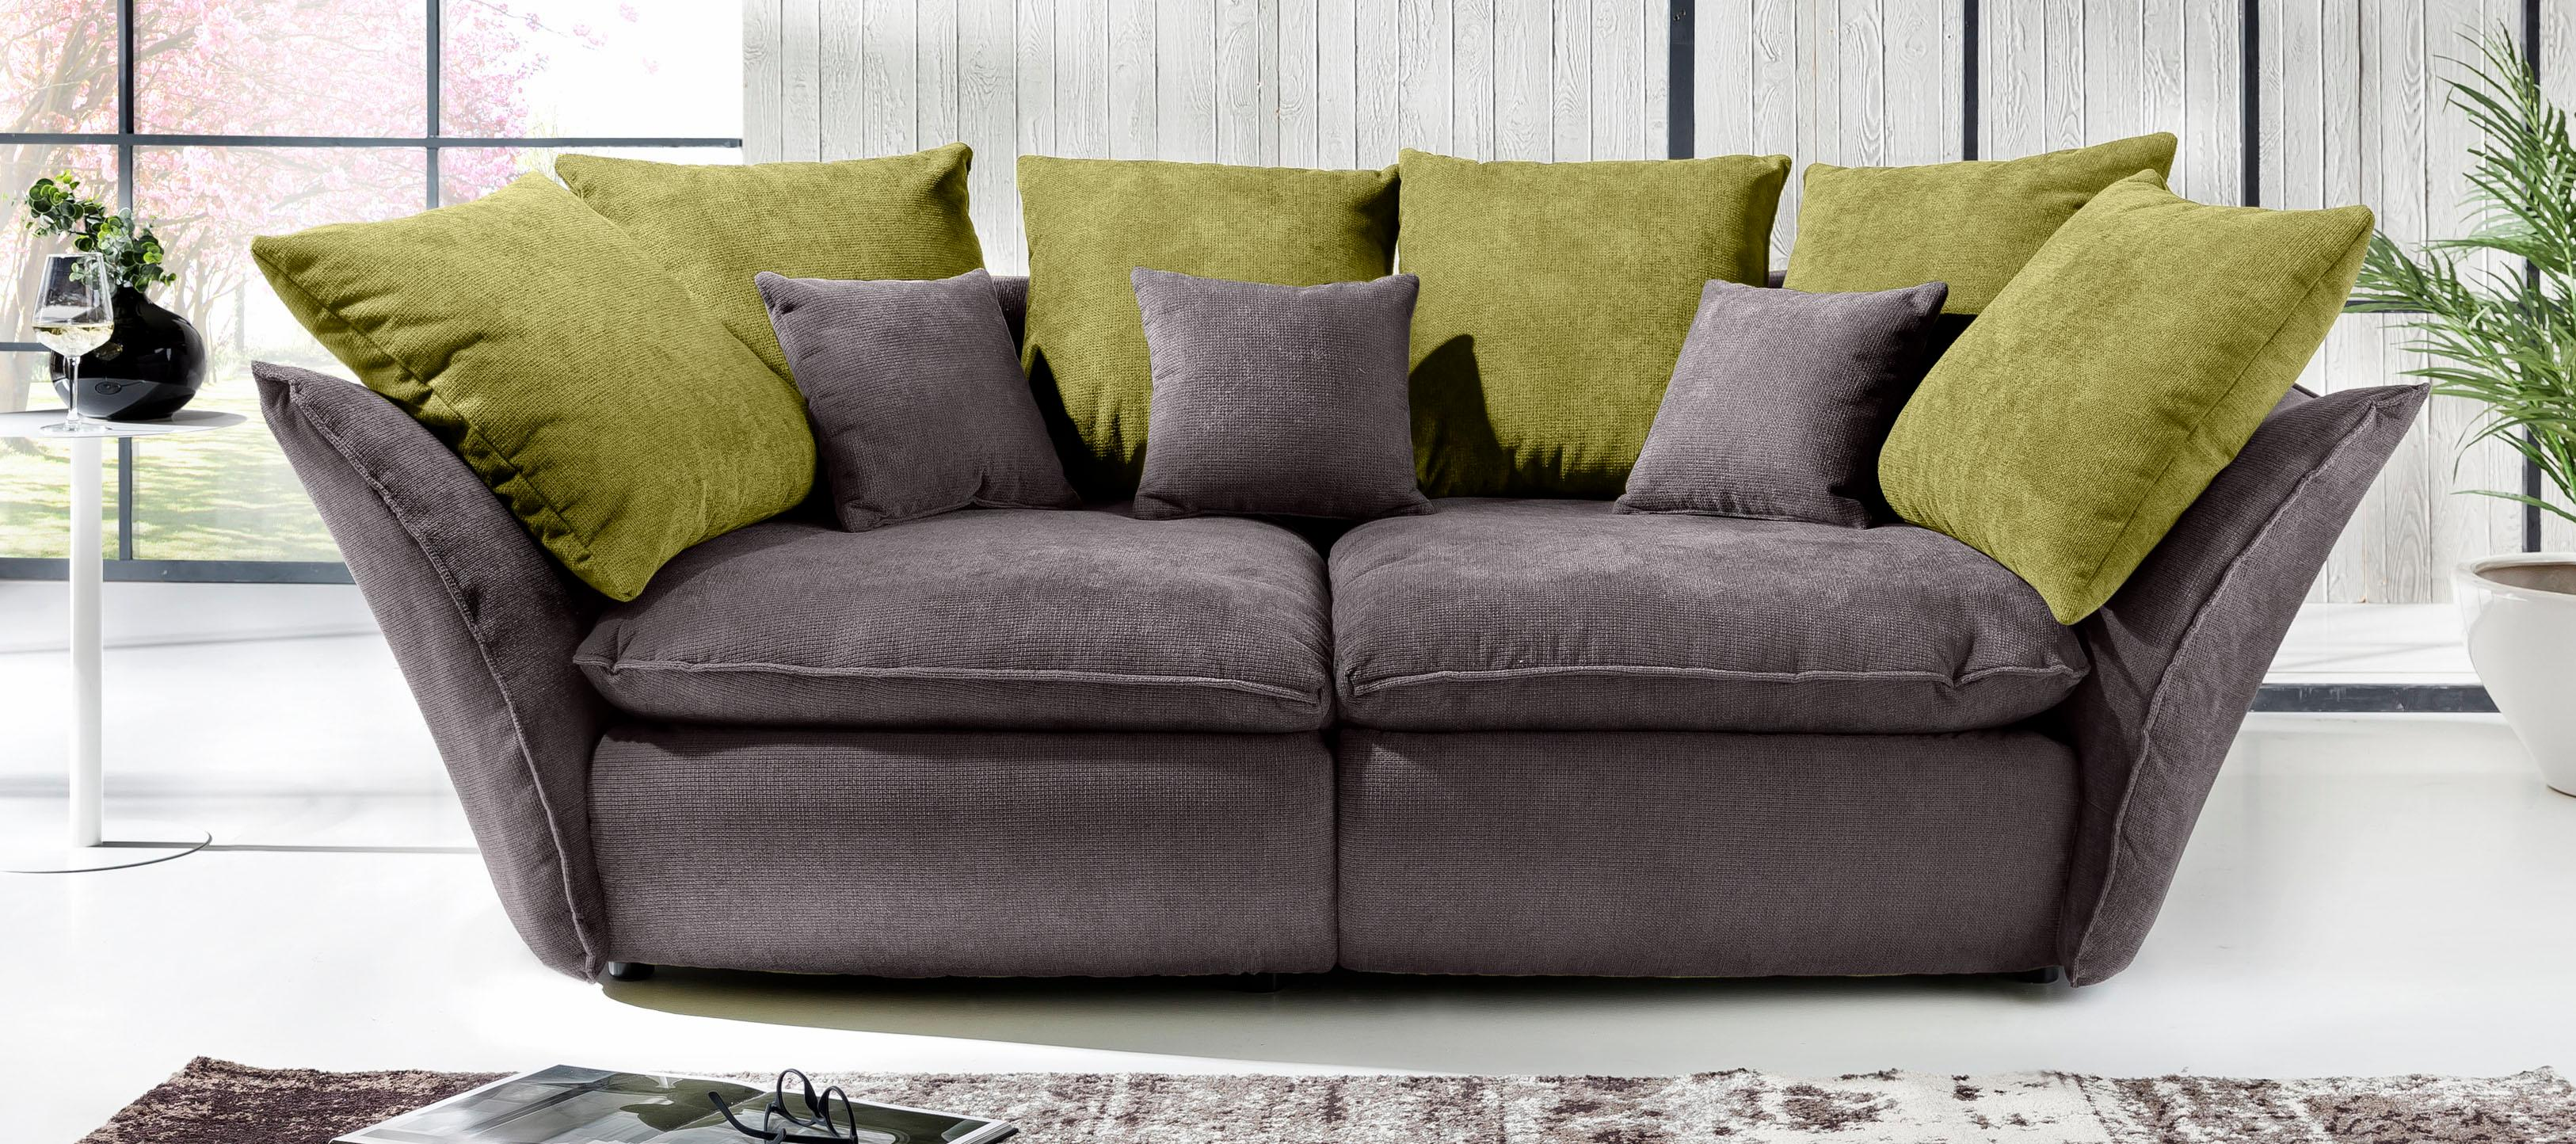 Home affaire Big-Sofa Heartbeat